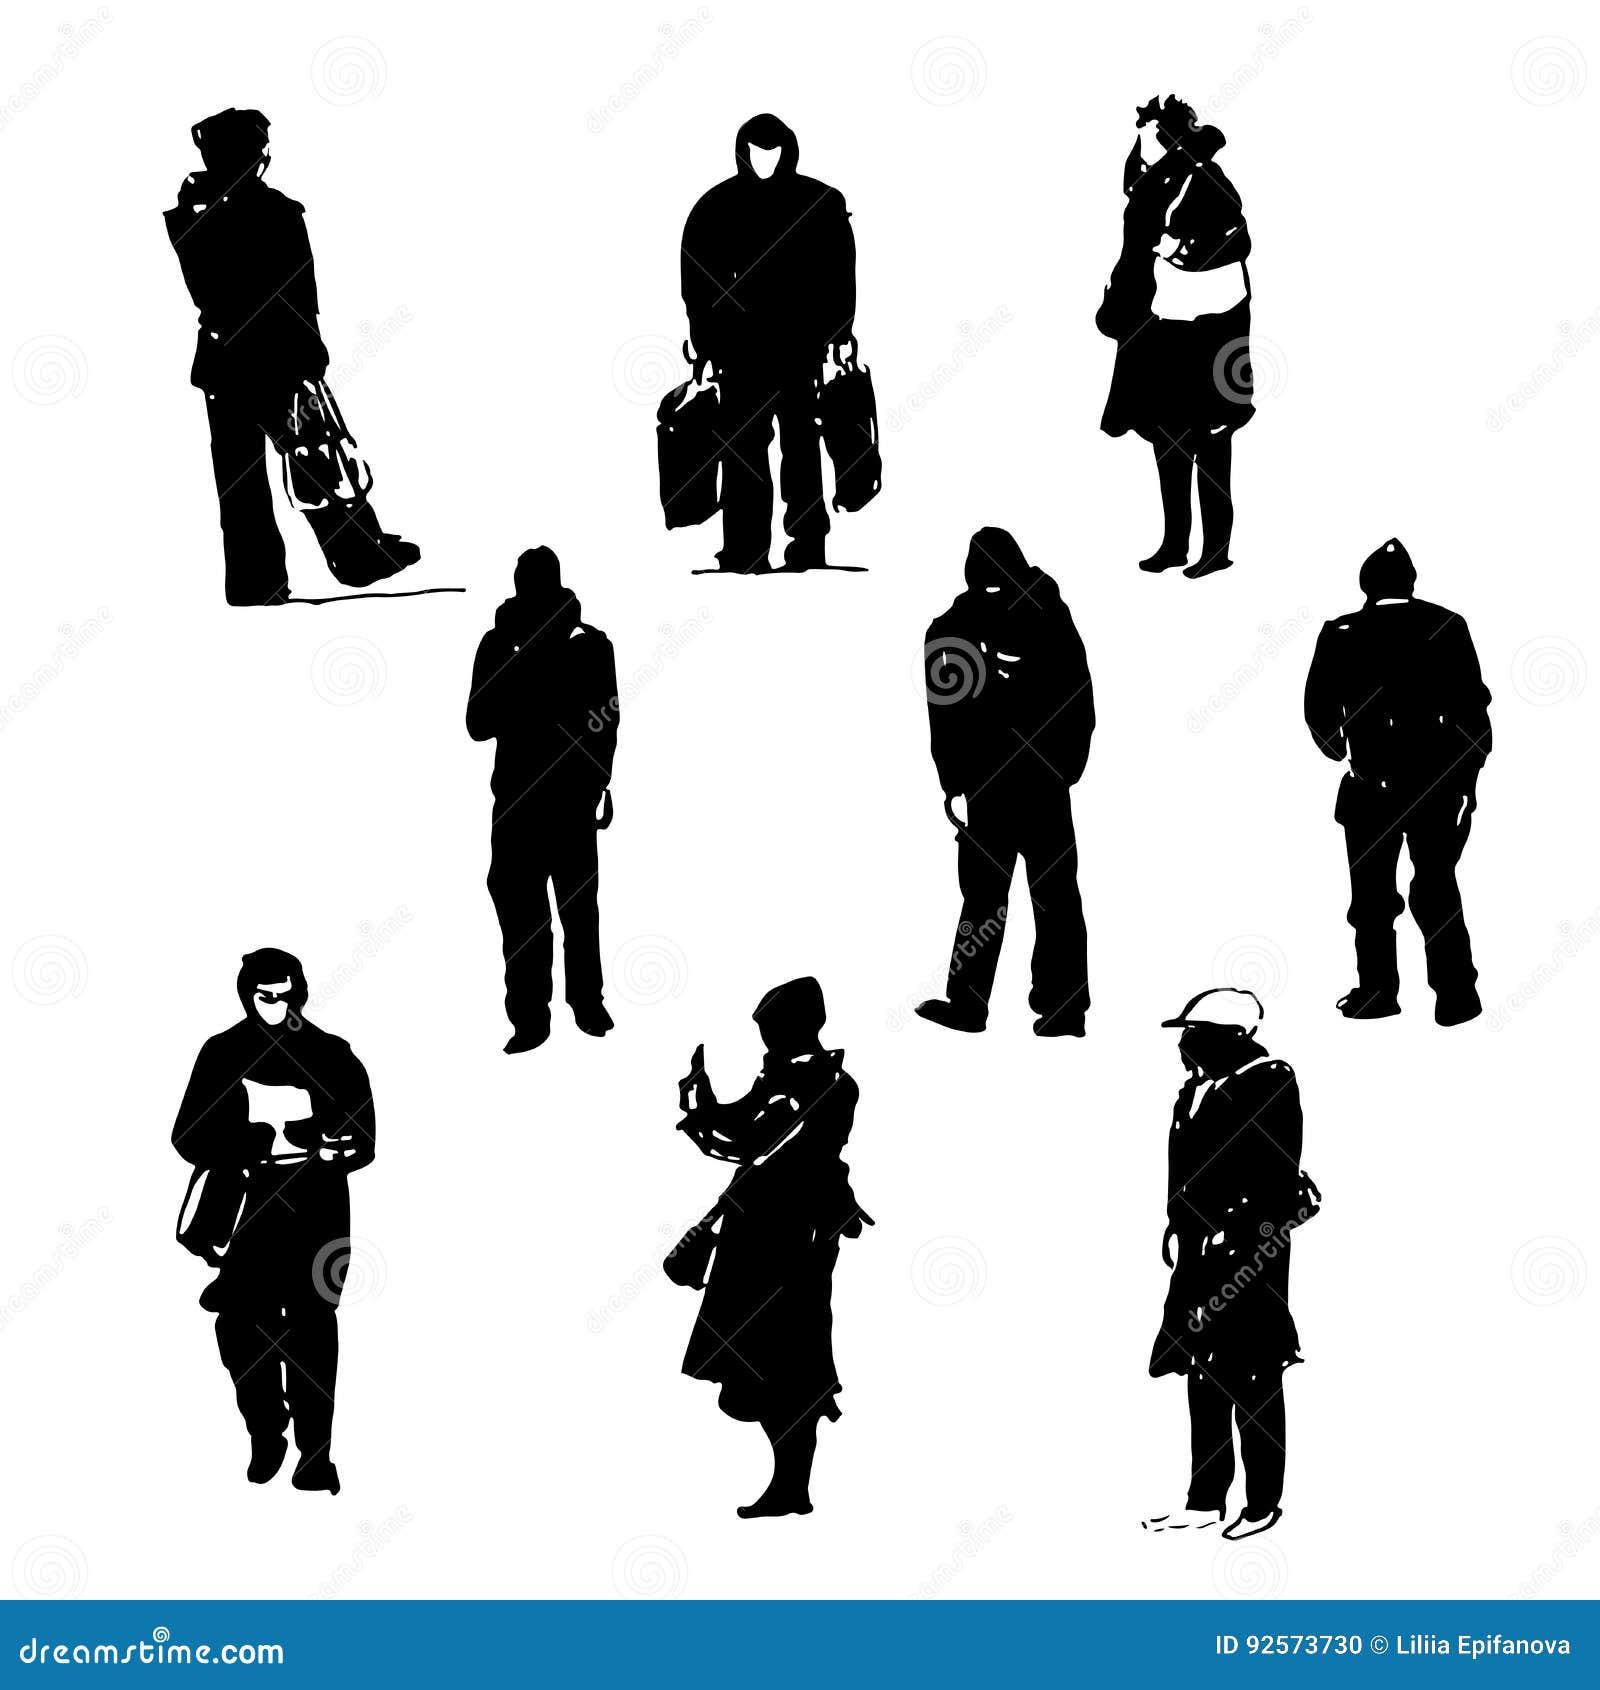 Human Body Silhouettes Vector Illustration